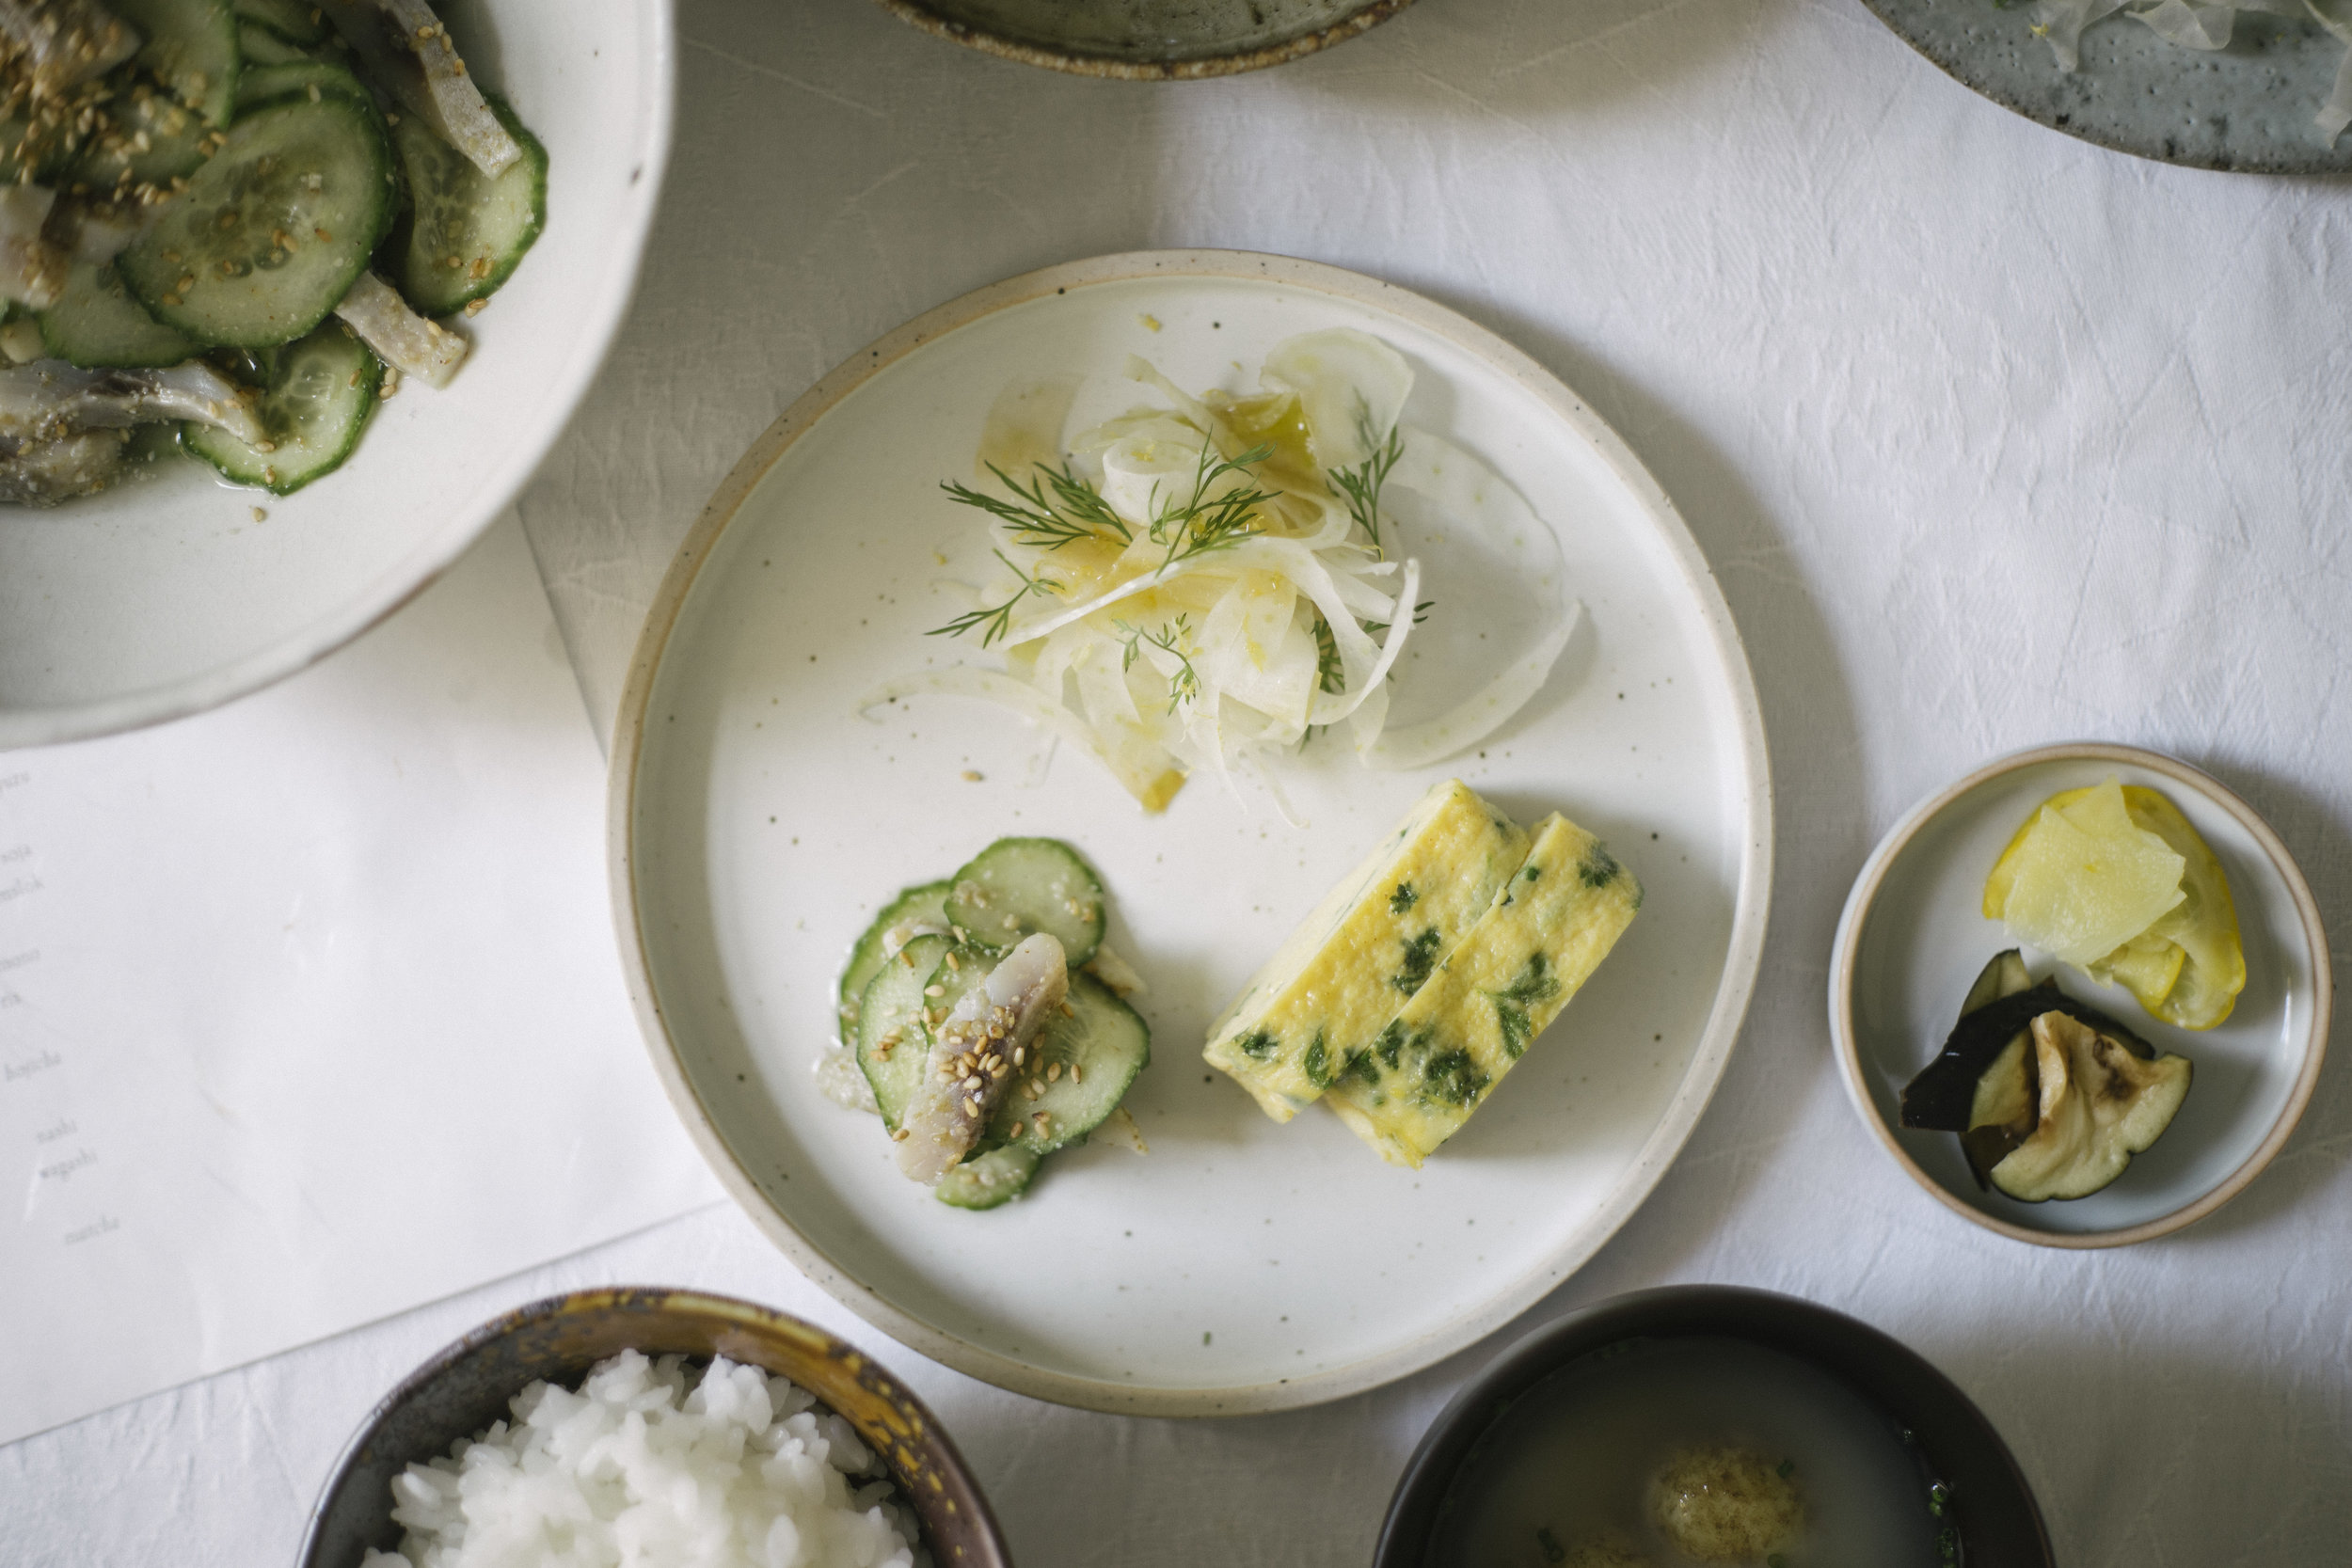 Japanese ichijuu sansai breakfast at Leaves & Grains - by shellsten